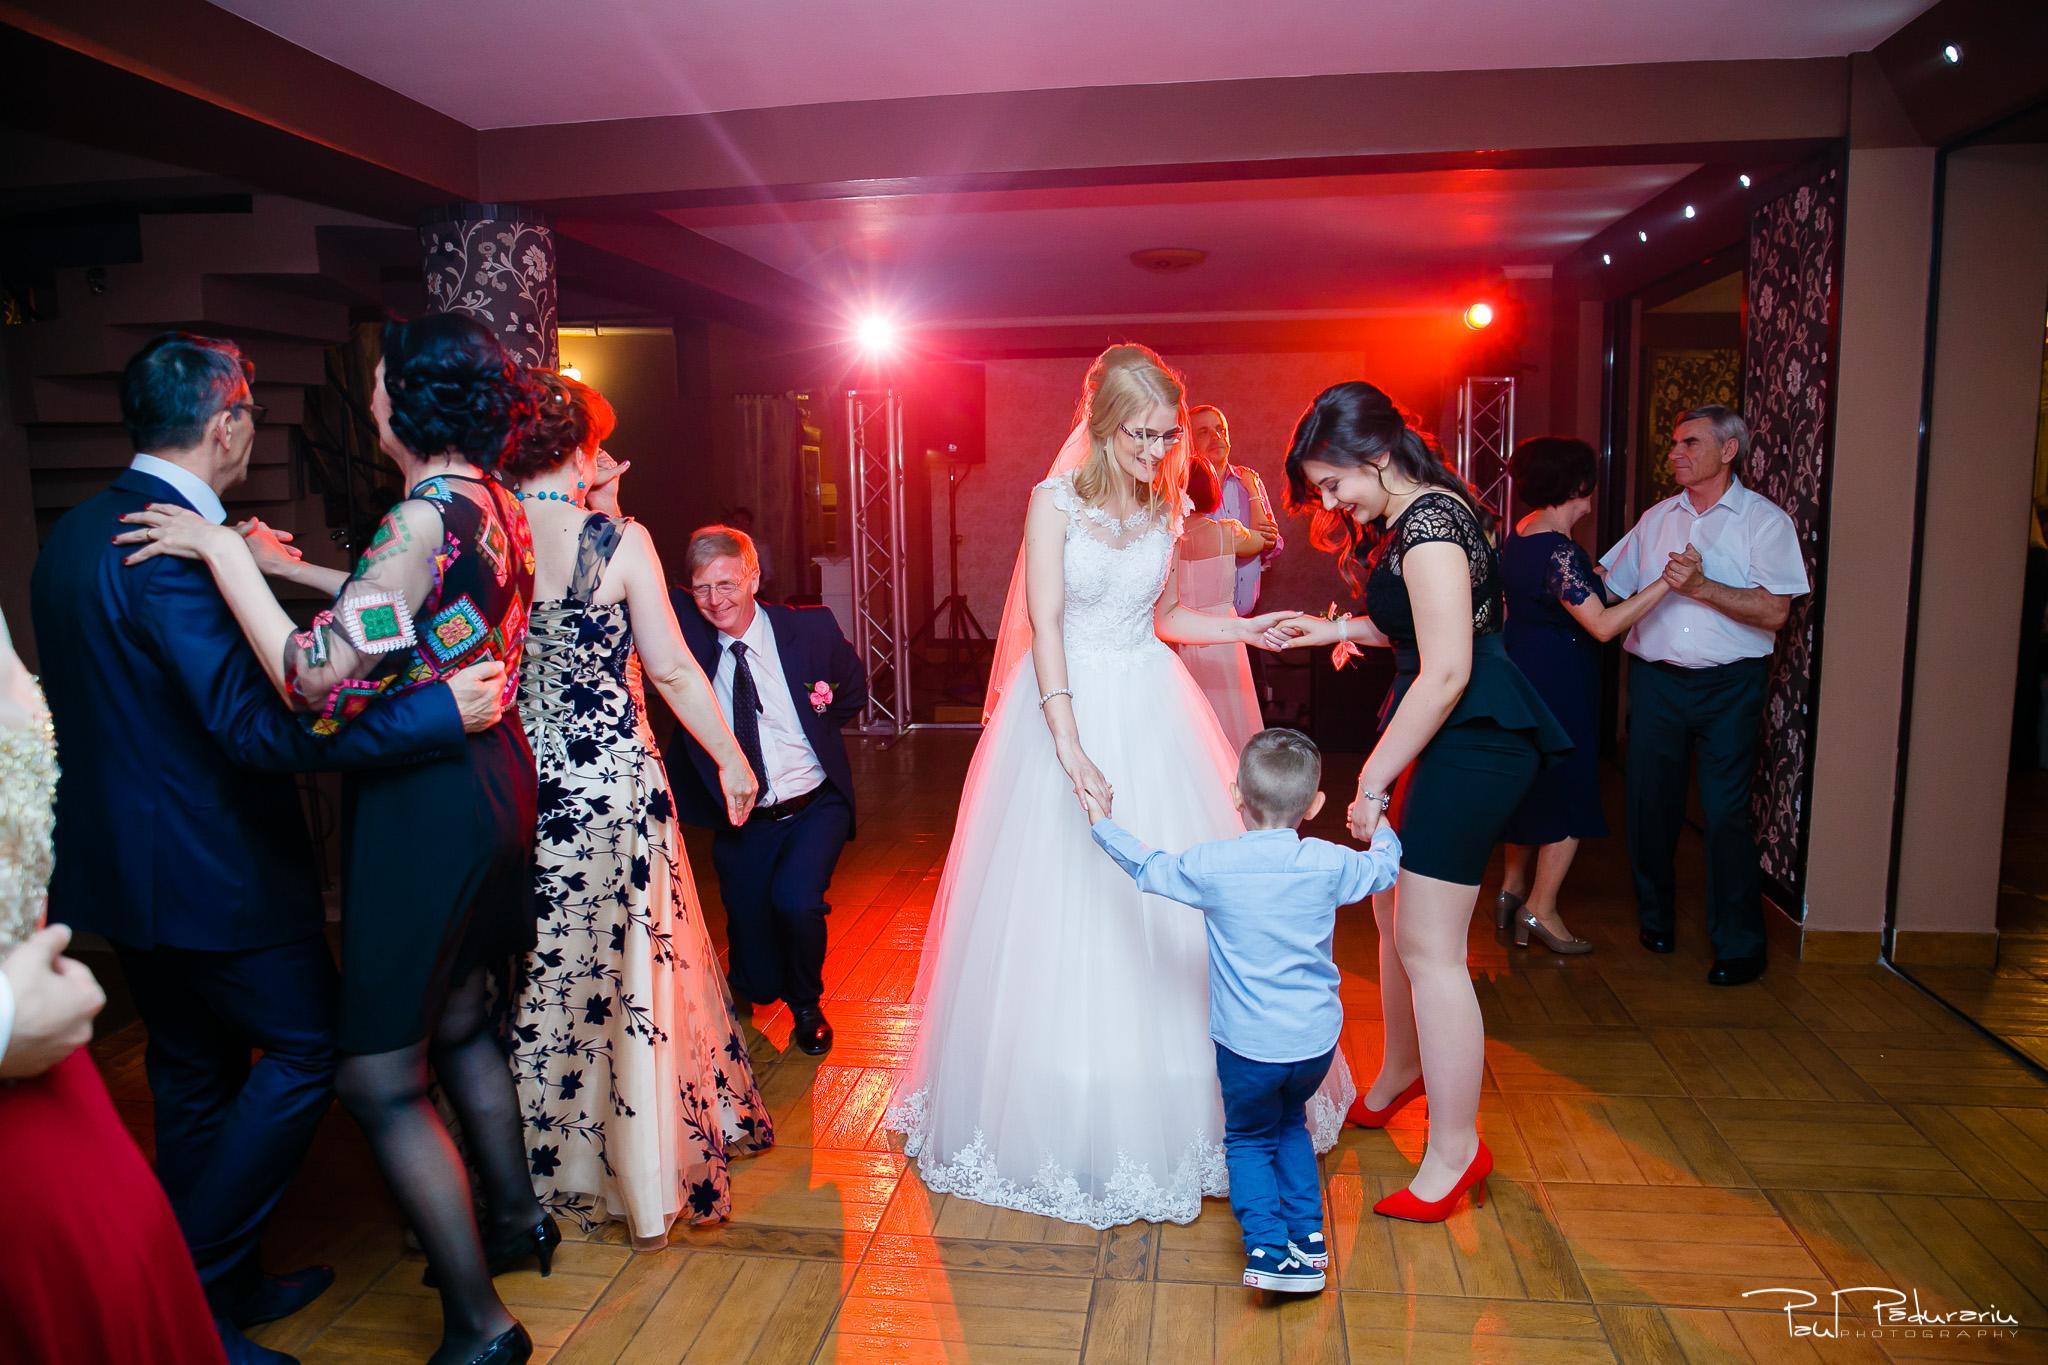 Anca si Razvan petrecere restaurant American Iasi - Paul Padurariu fotograf profesionist nunta iasi www.paulpadurariu.ro © 2018 Paul Padurariu 1